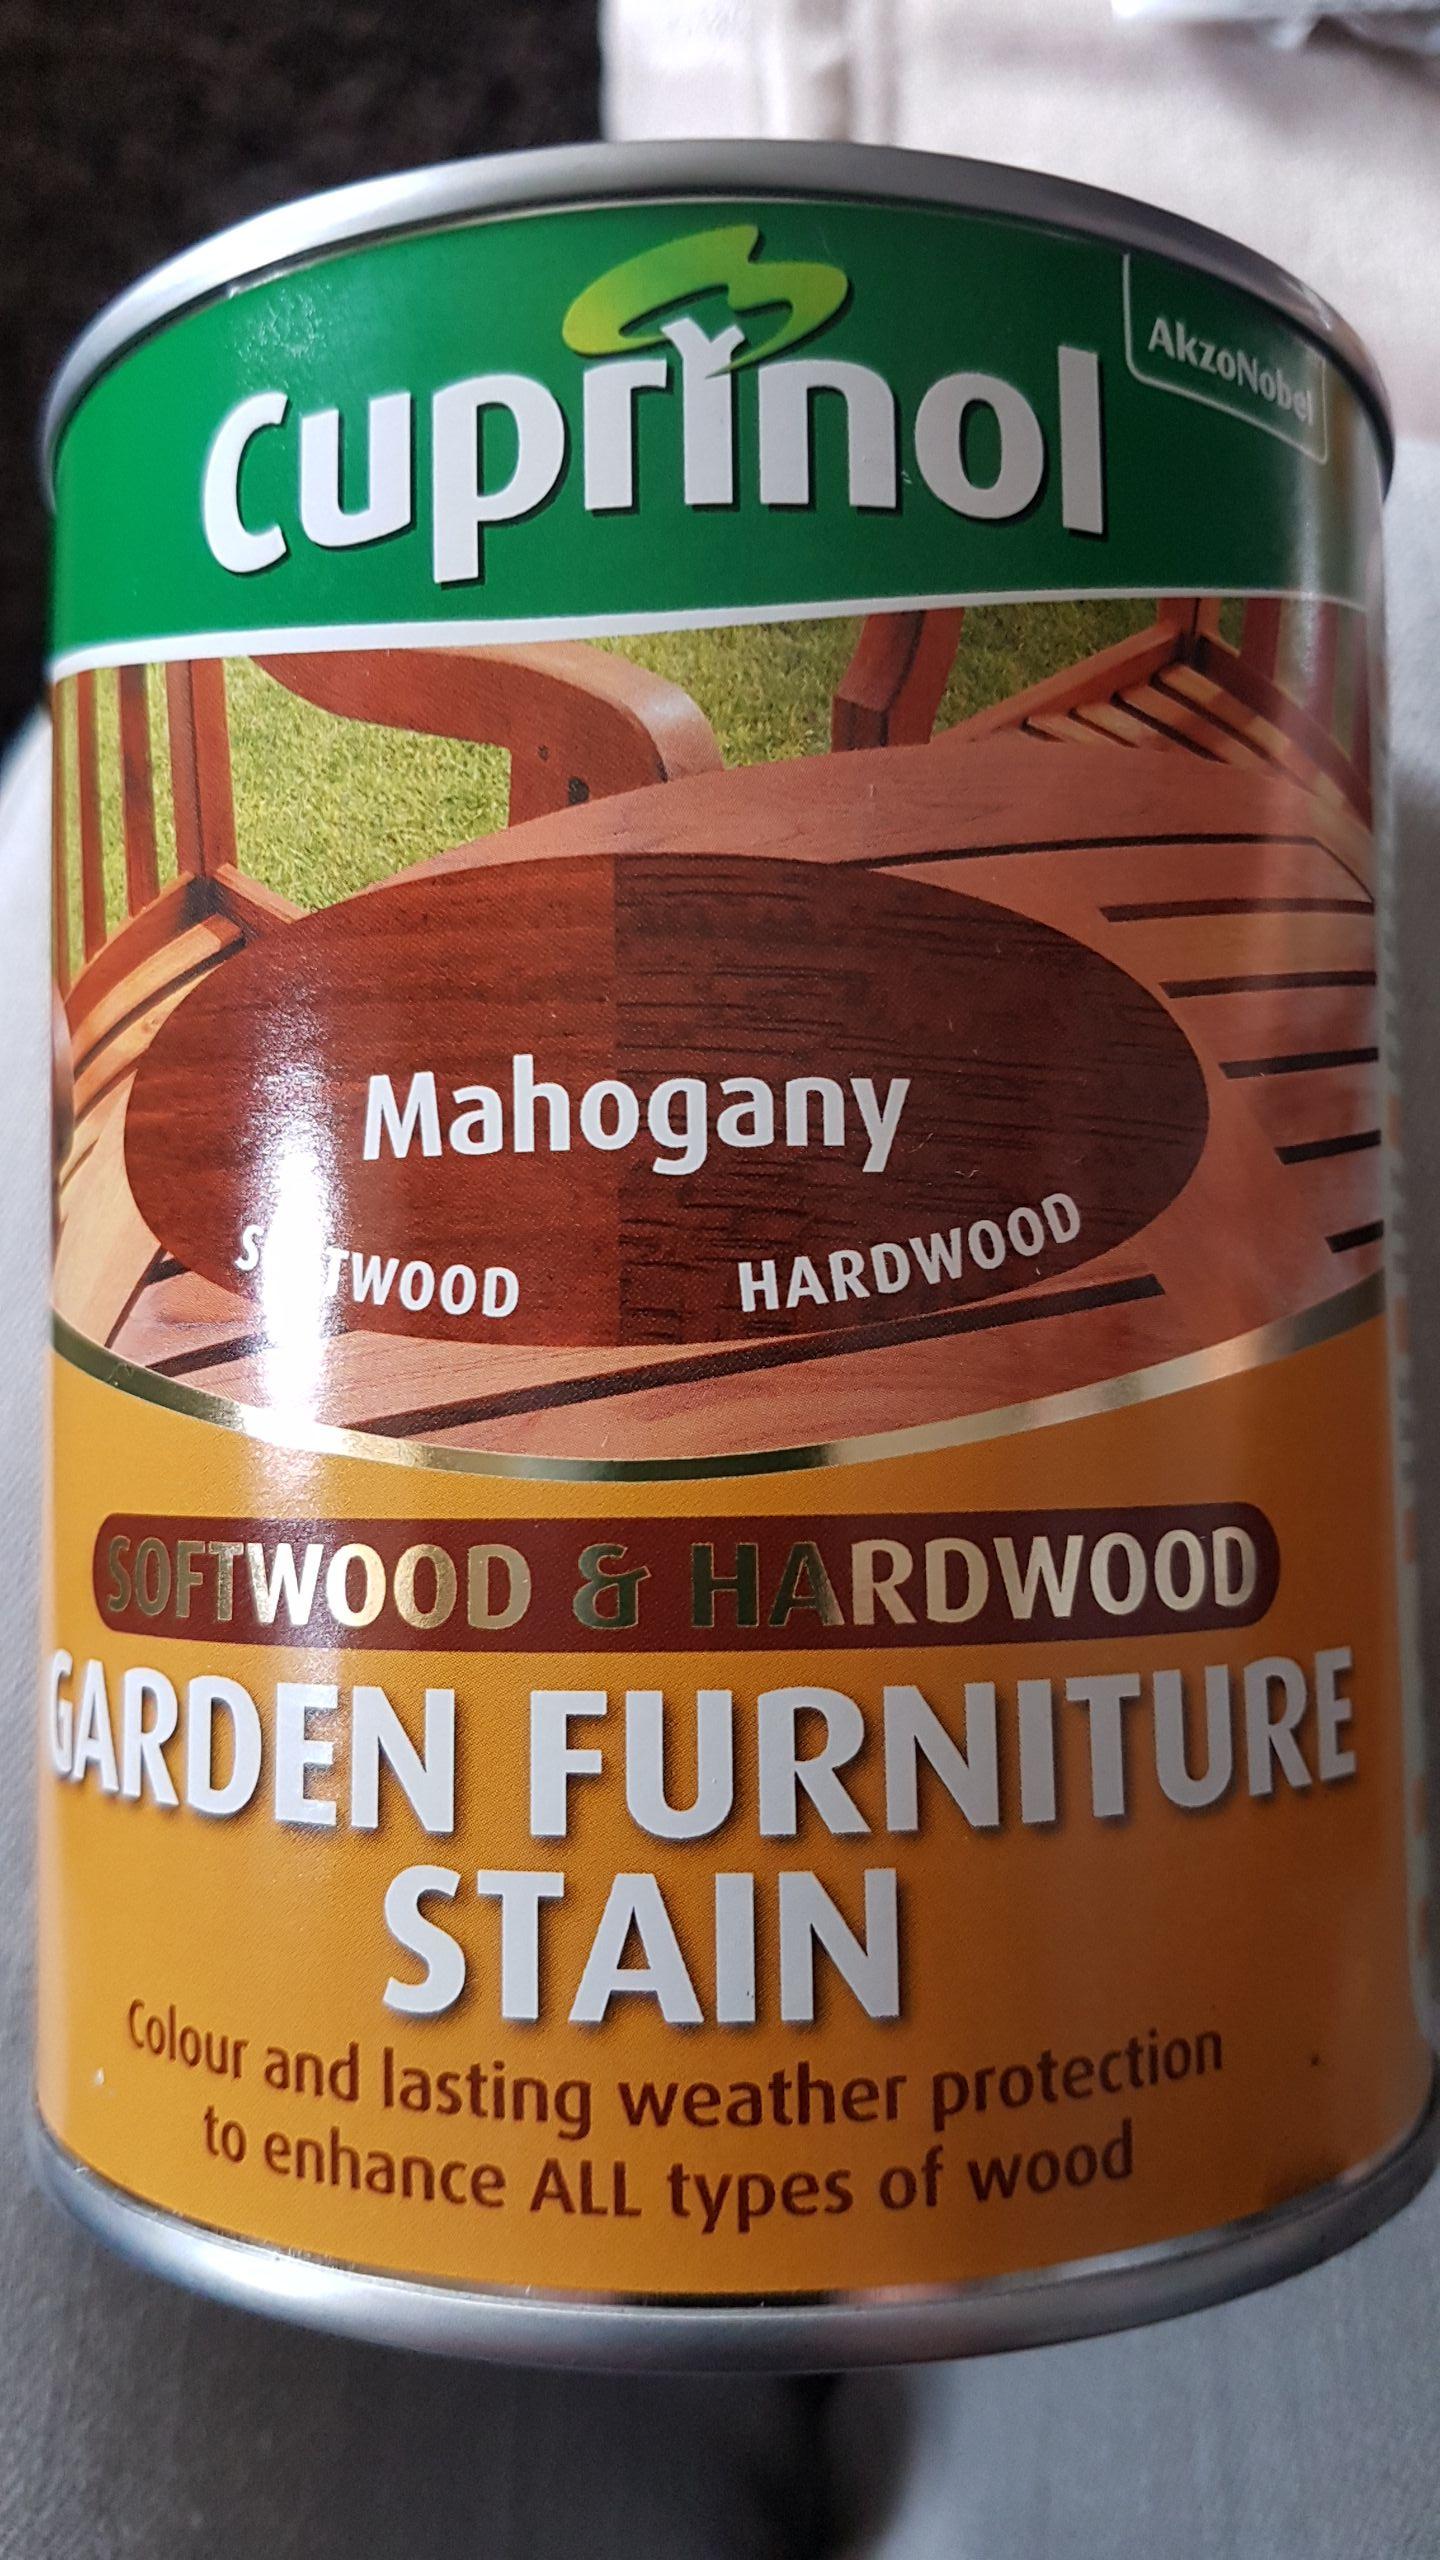 Cuprinol garden furniture stain mahogany 750ml @ Wilko (Brentwood)